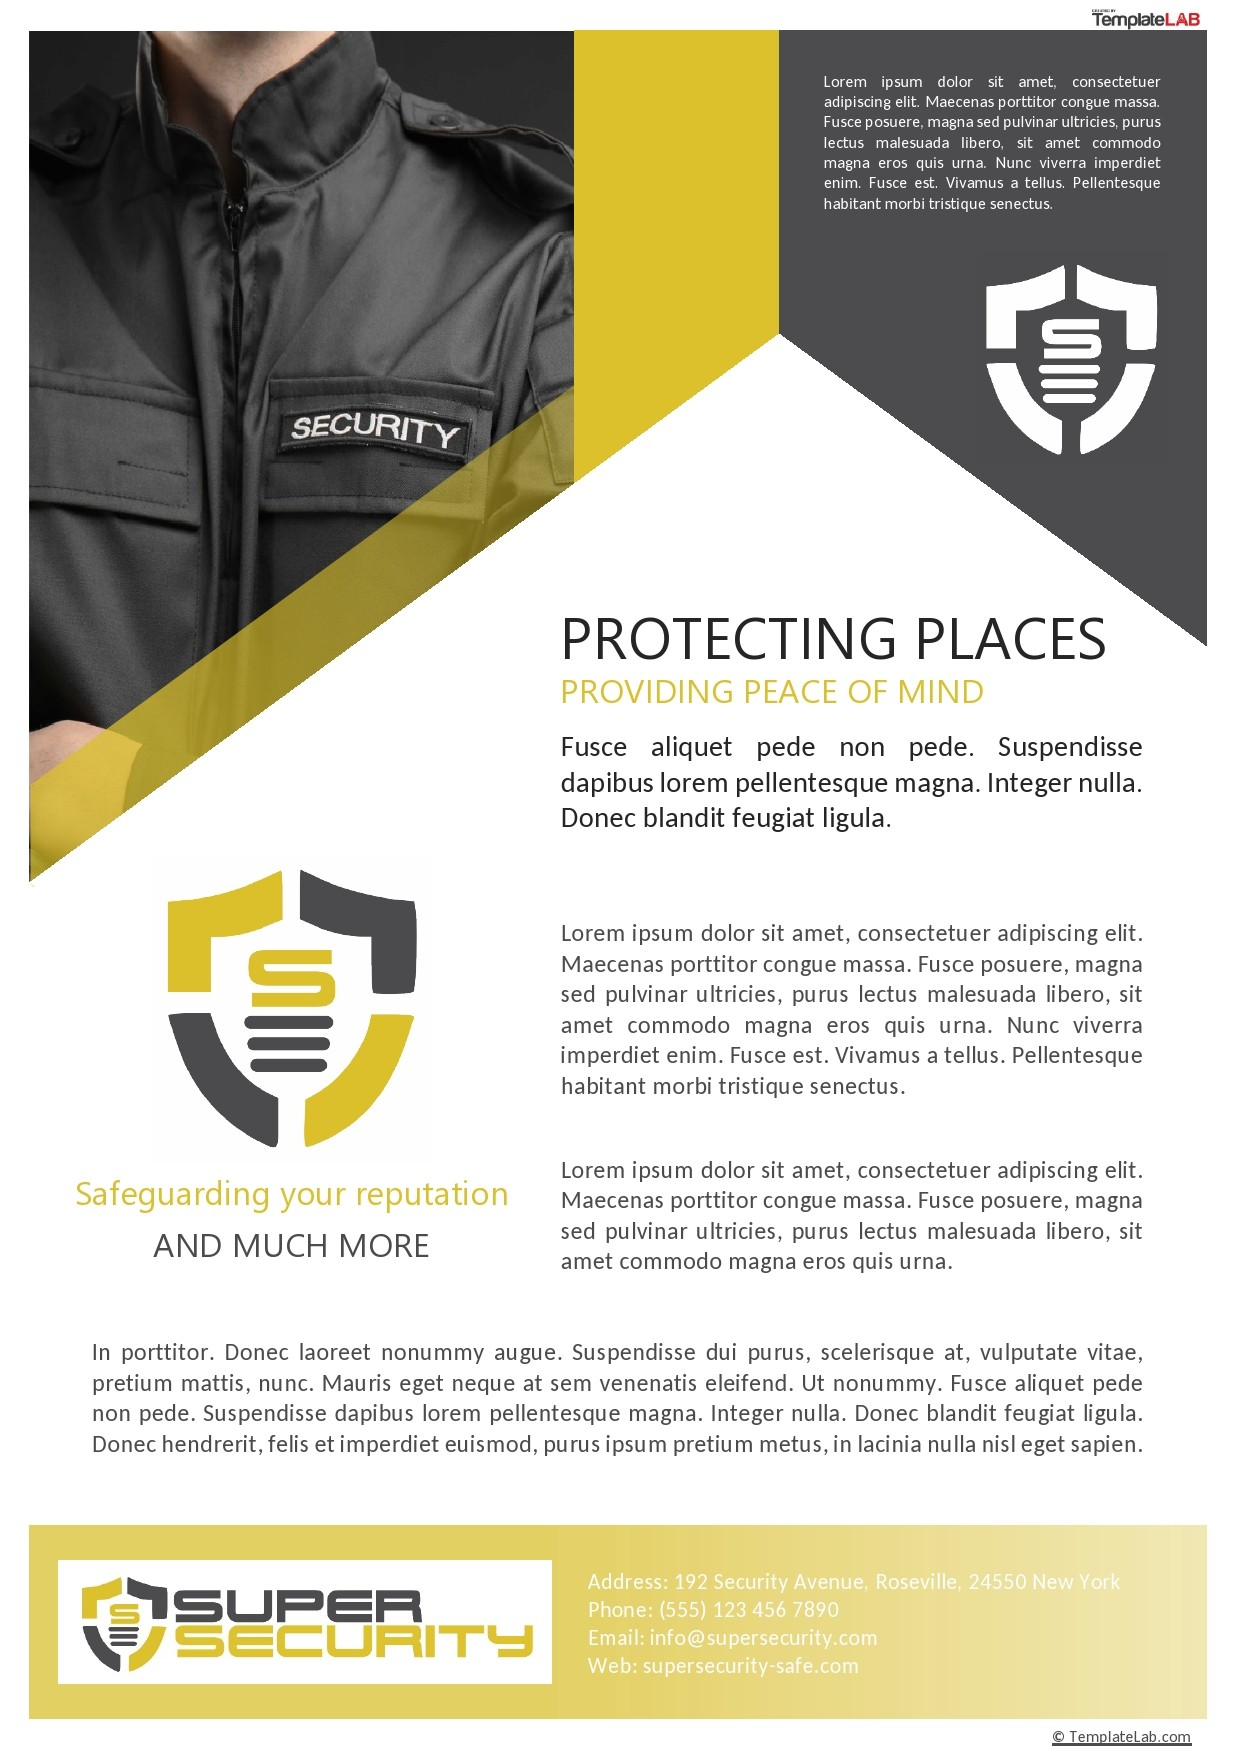 Free Security Company Profile Template - TemplateLab.com